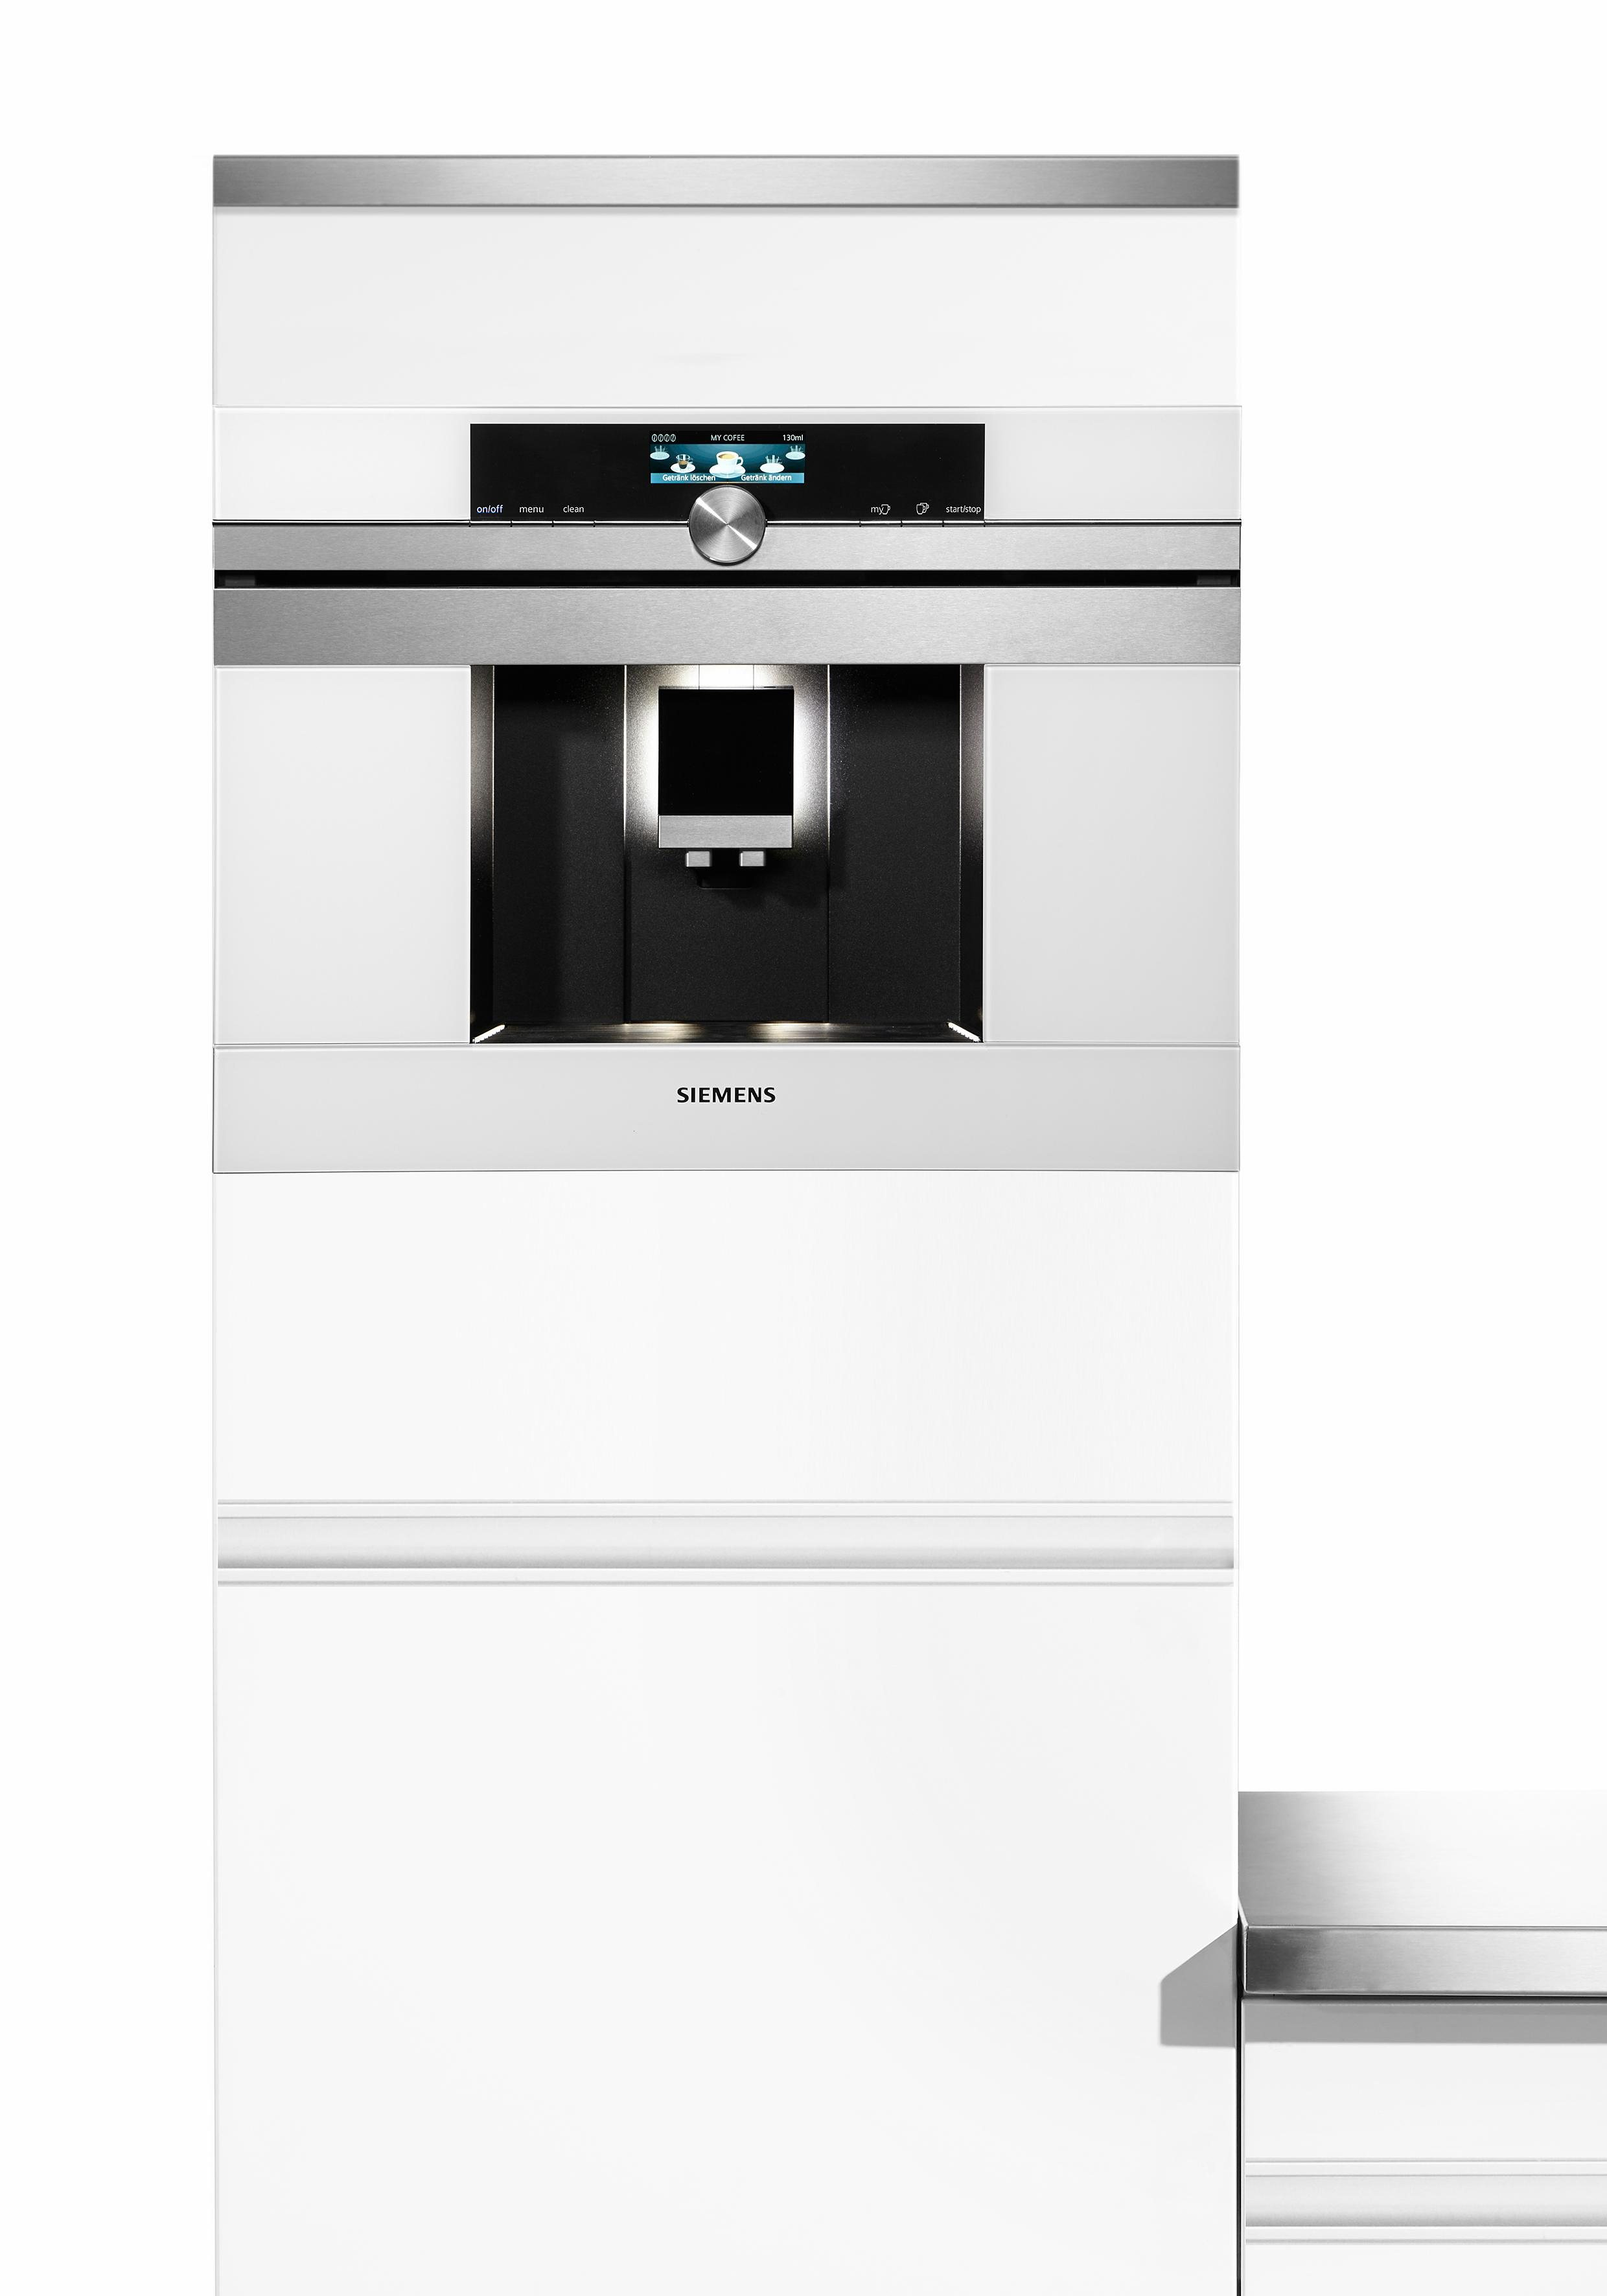 SIEMENS Einbau-Kaffeevollautomaten iQ700 CT636LEW1